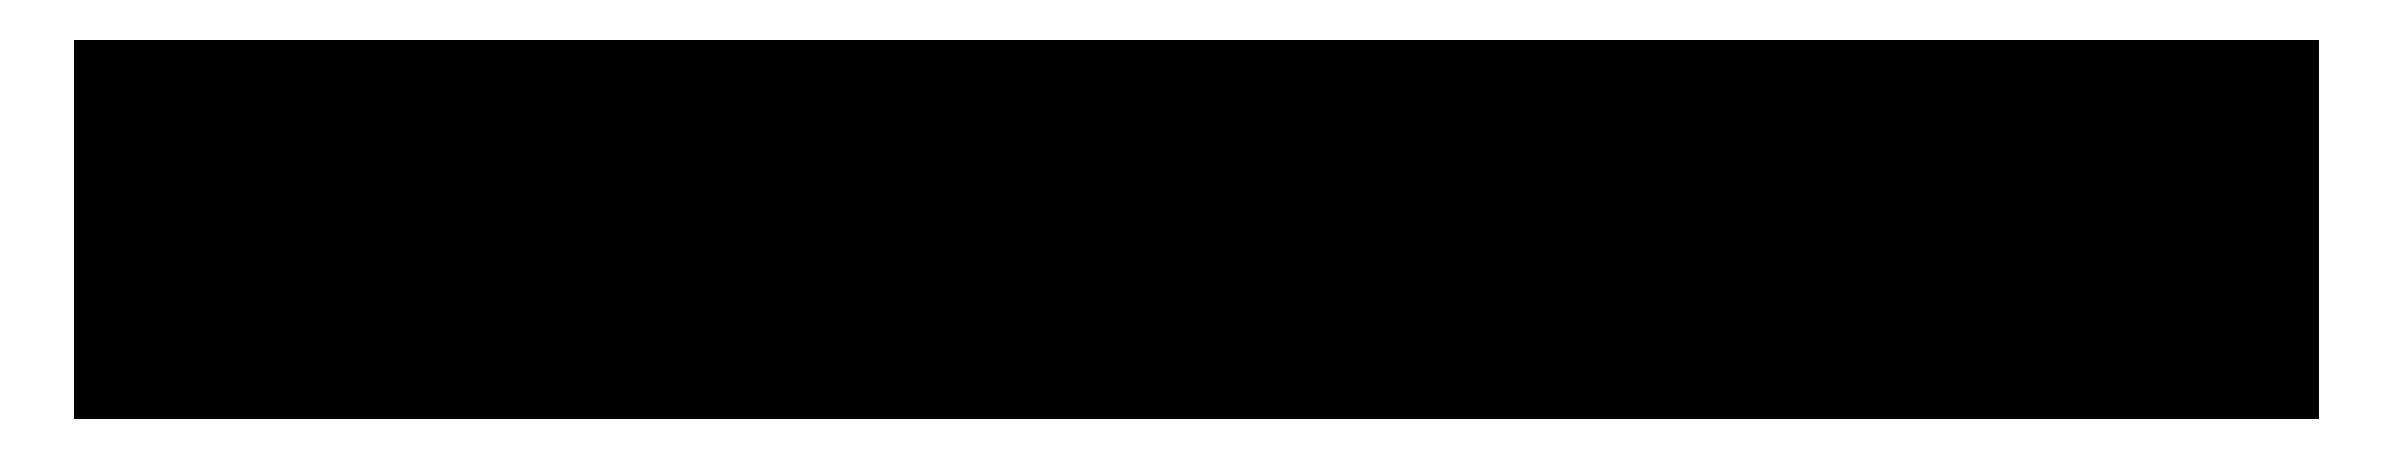 3dx_companylogo_black (7)